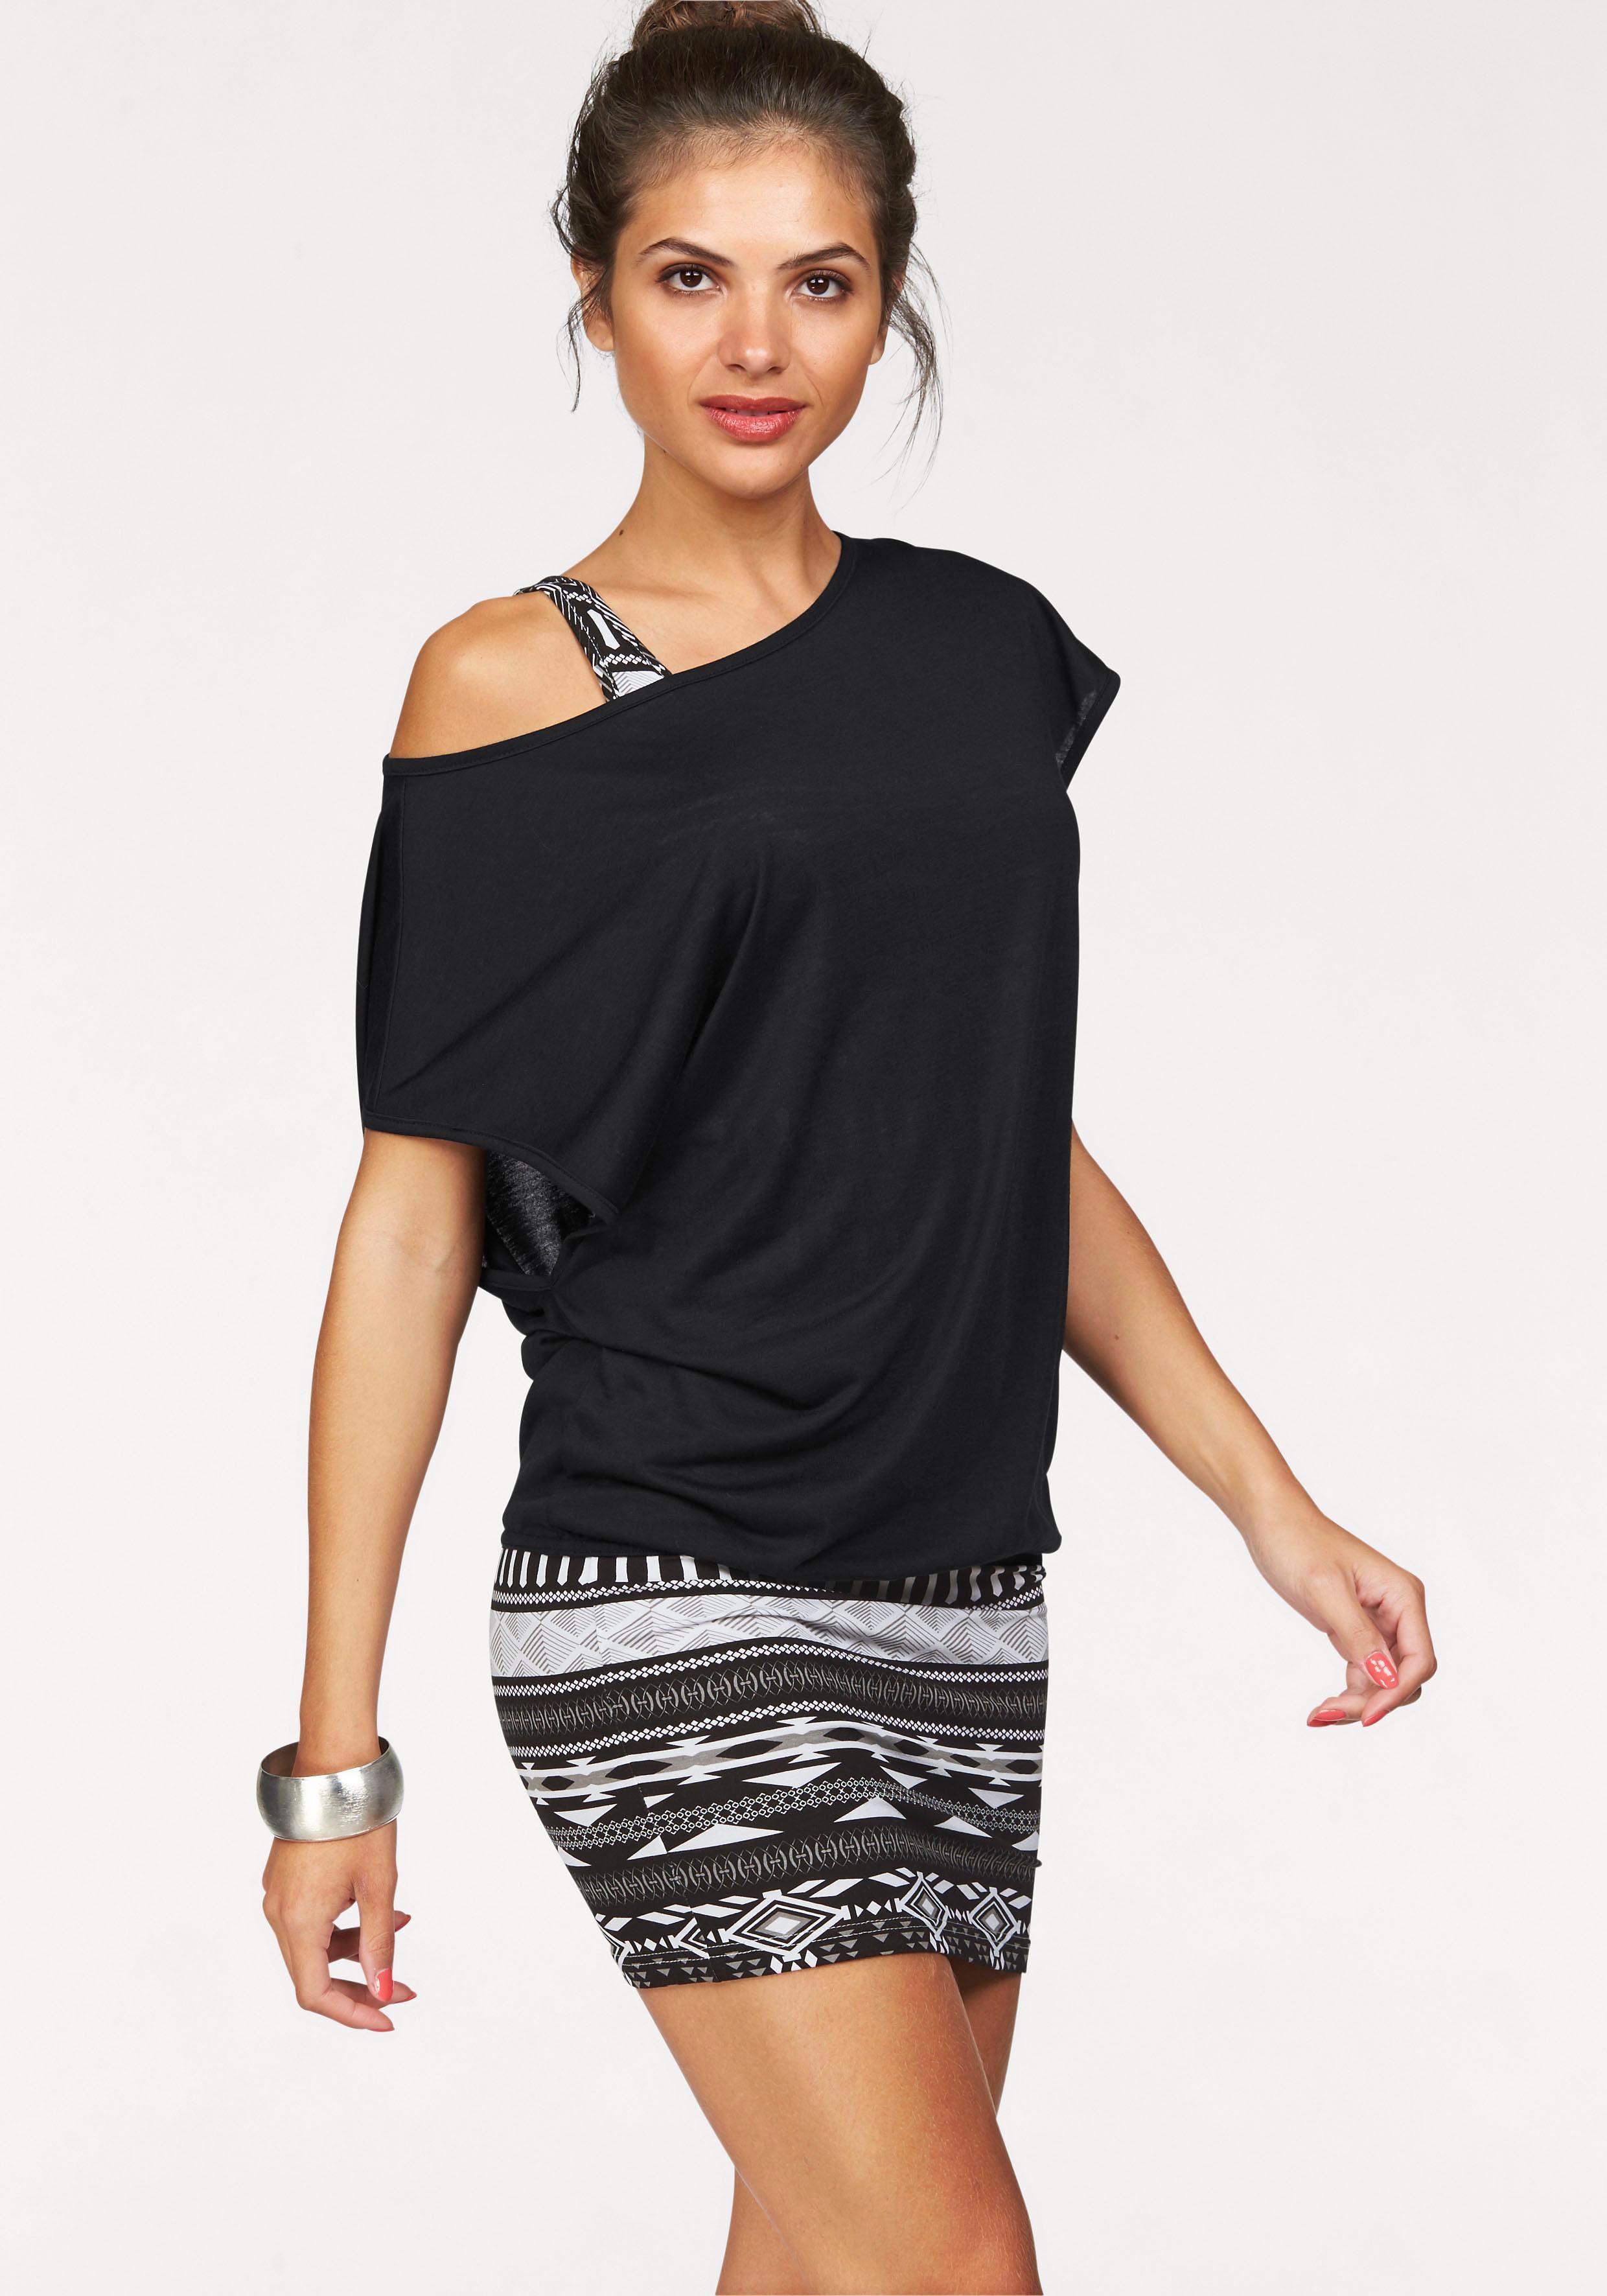 bcaf899db924d4 AJC 2-in-1-jurk in set online verkrijgbaar